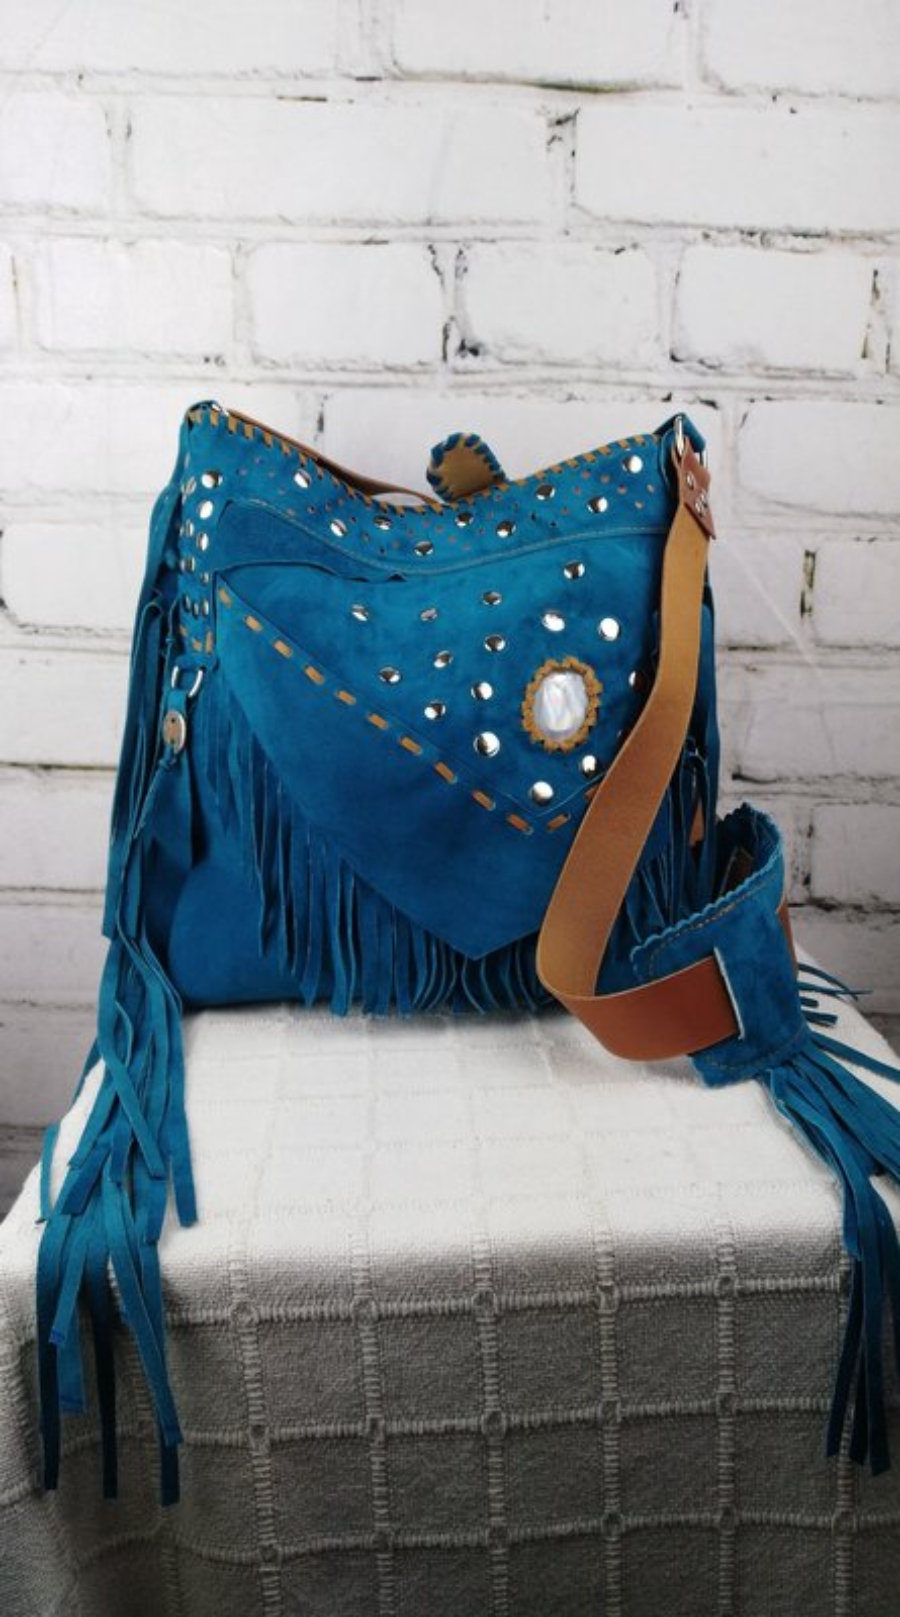 Bolso de Piel de Ante Azul Suave con Flecos